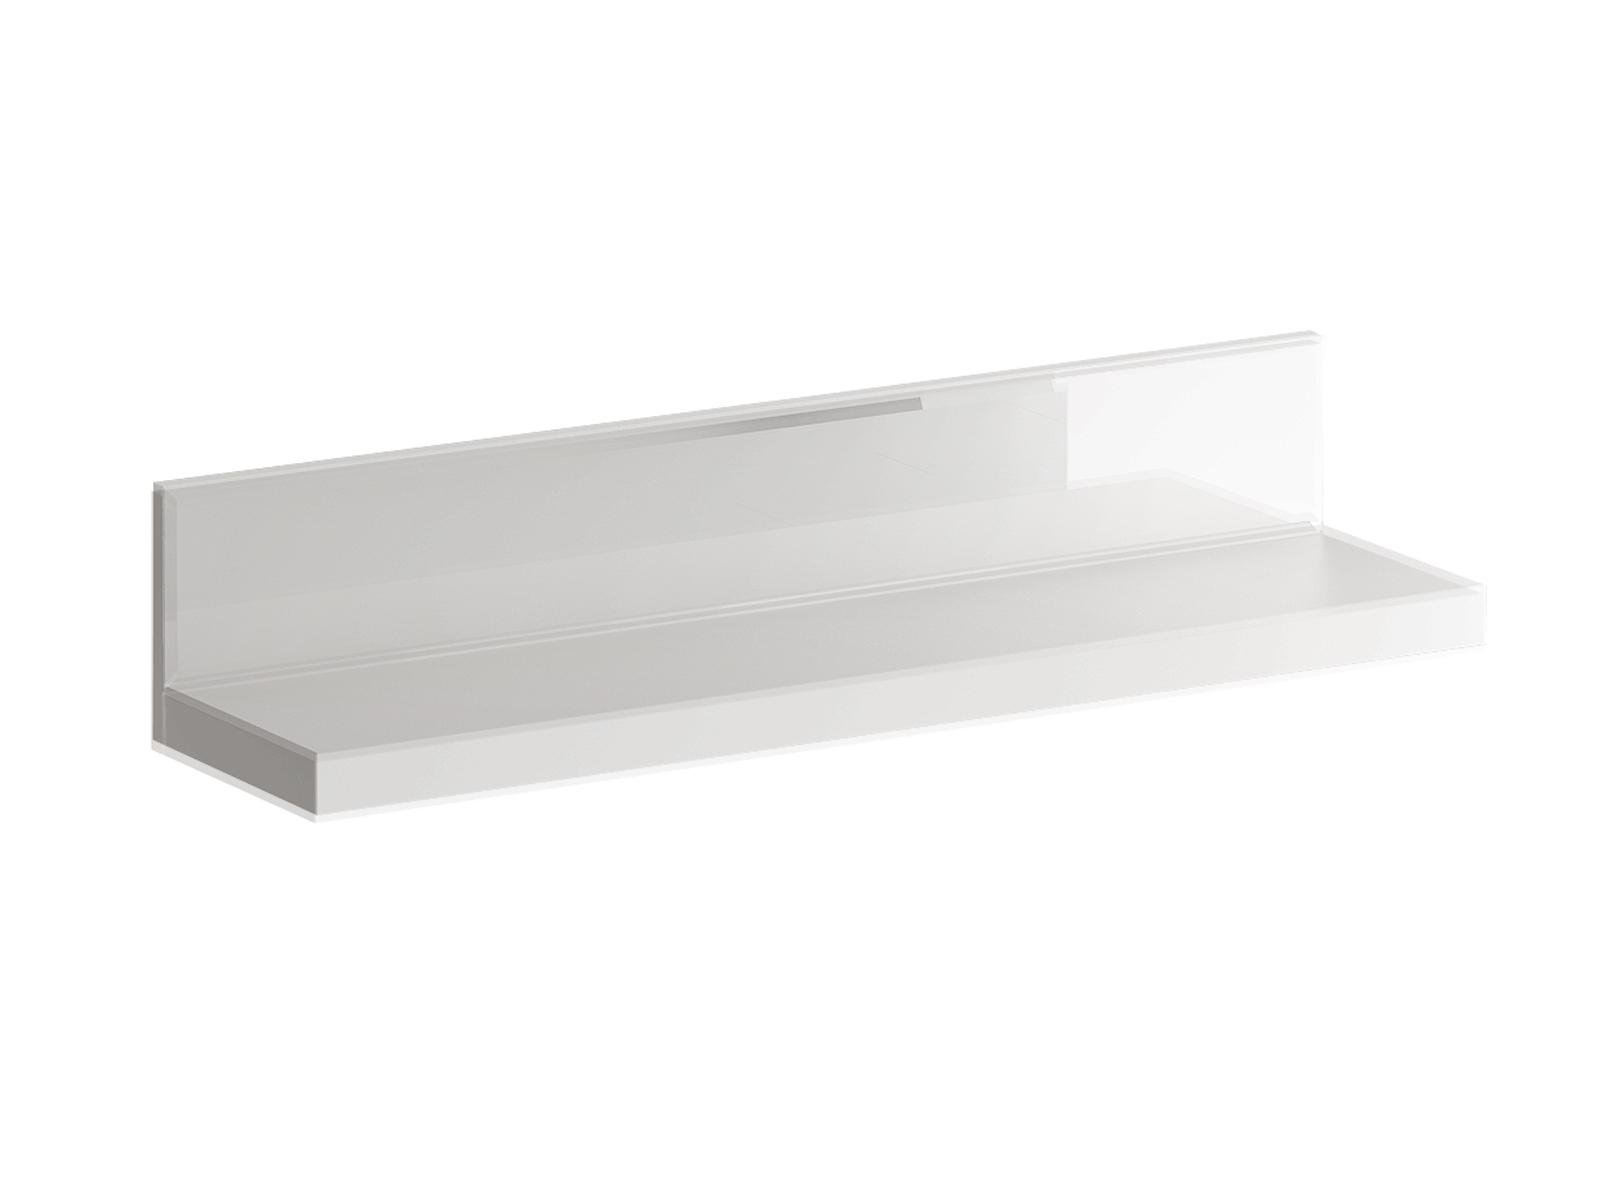 Полка KristalПолки<br>Фасад - стекло белое.<br><br>Material: ДСП<br>Ширина см: 96<br>Высота см: 18<br>Глубина см: 23